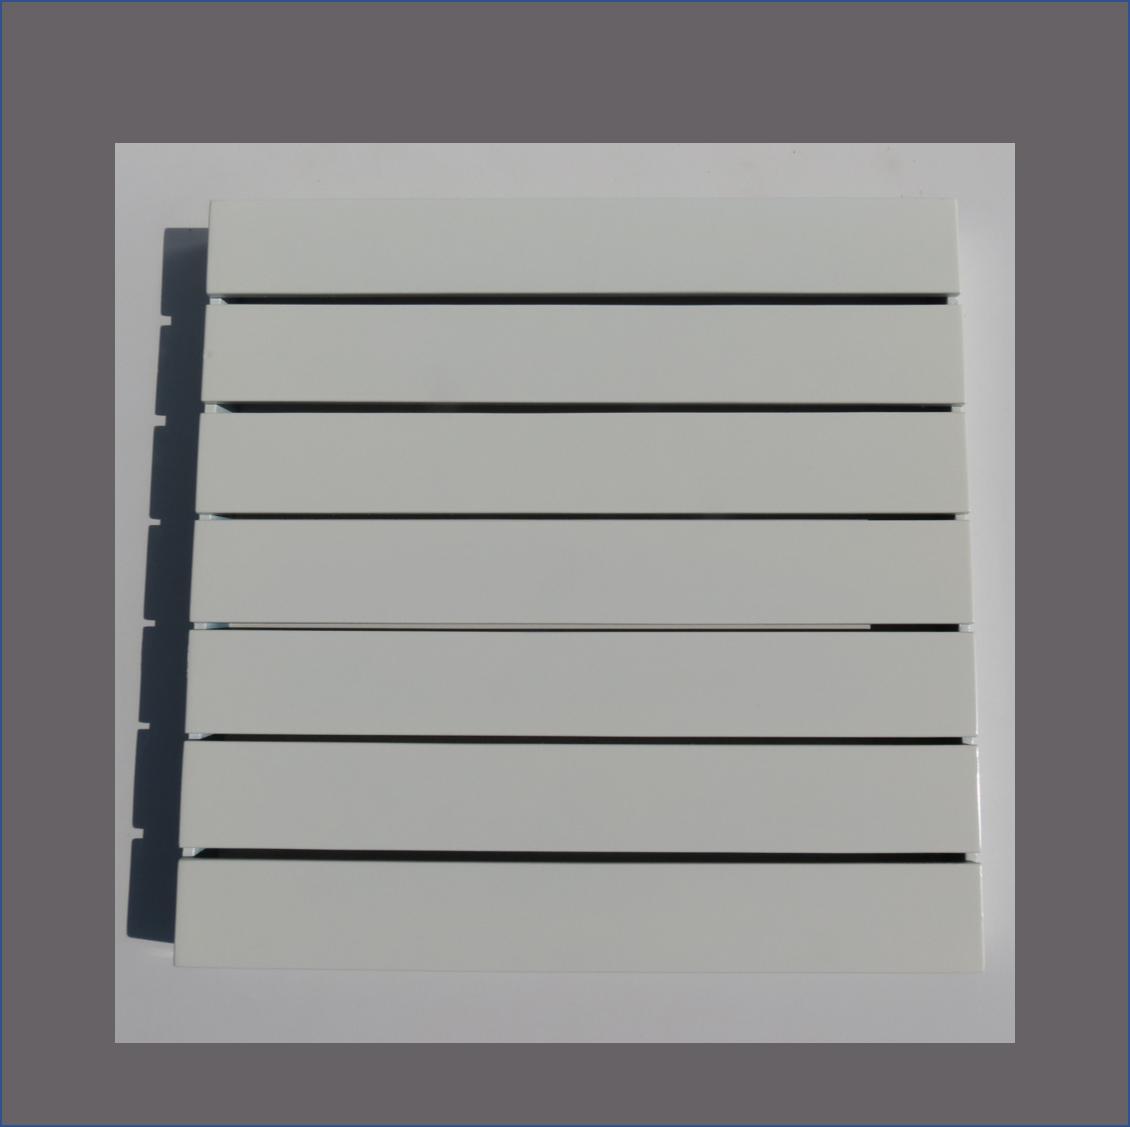 slatted-square-centre-piece-blackwhite